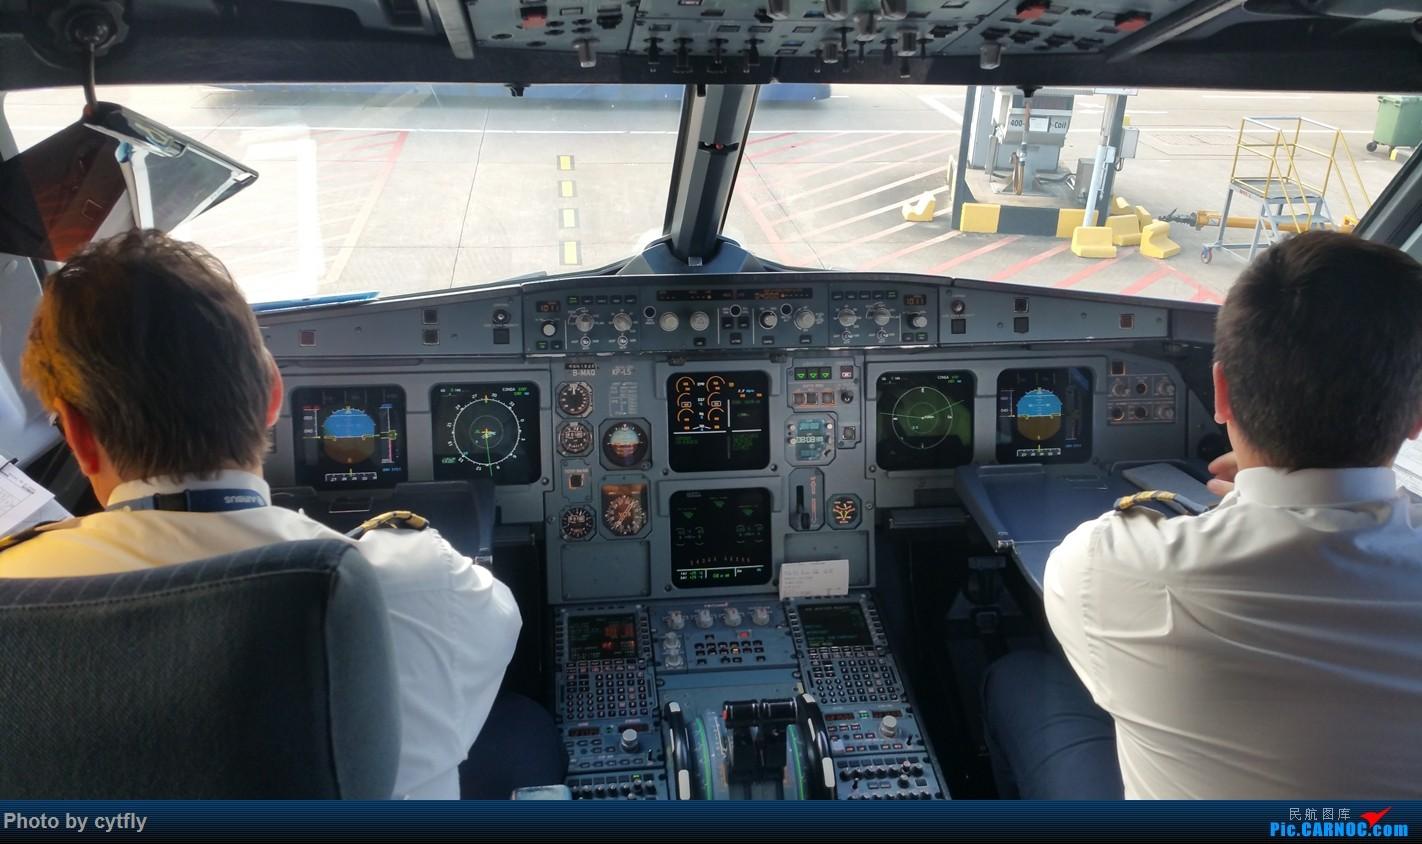 Re:[原创]【北向の飞行】澳门出差7日行——离职前最后一次搭乘澳门航空飞行 AIRBUS A321-200 B-MAQ 中国澳门国际机场